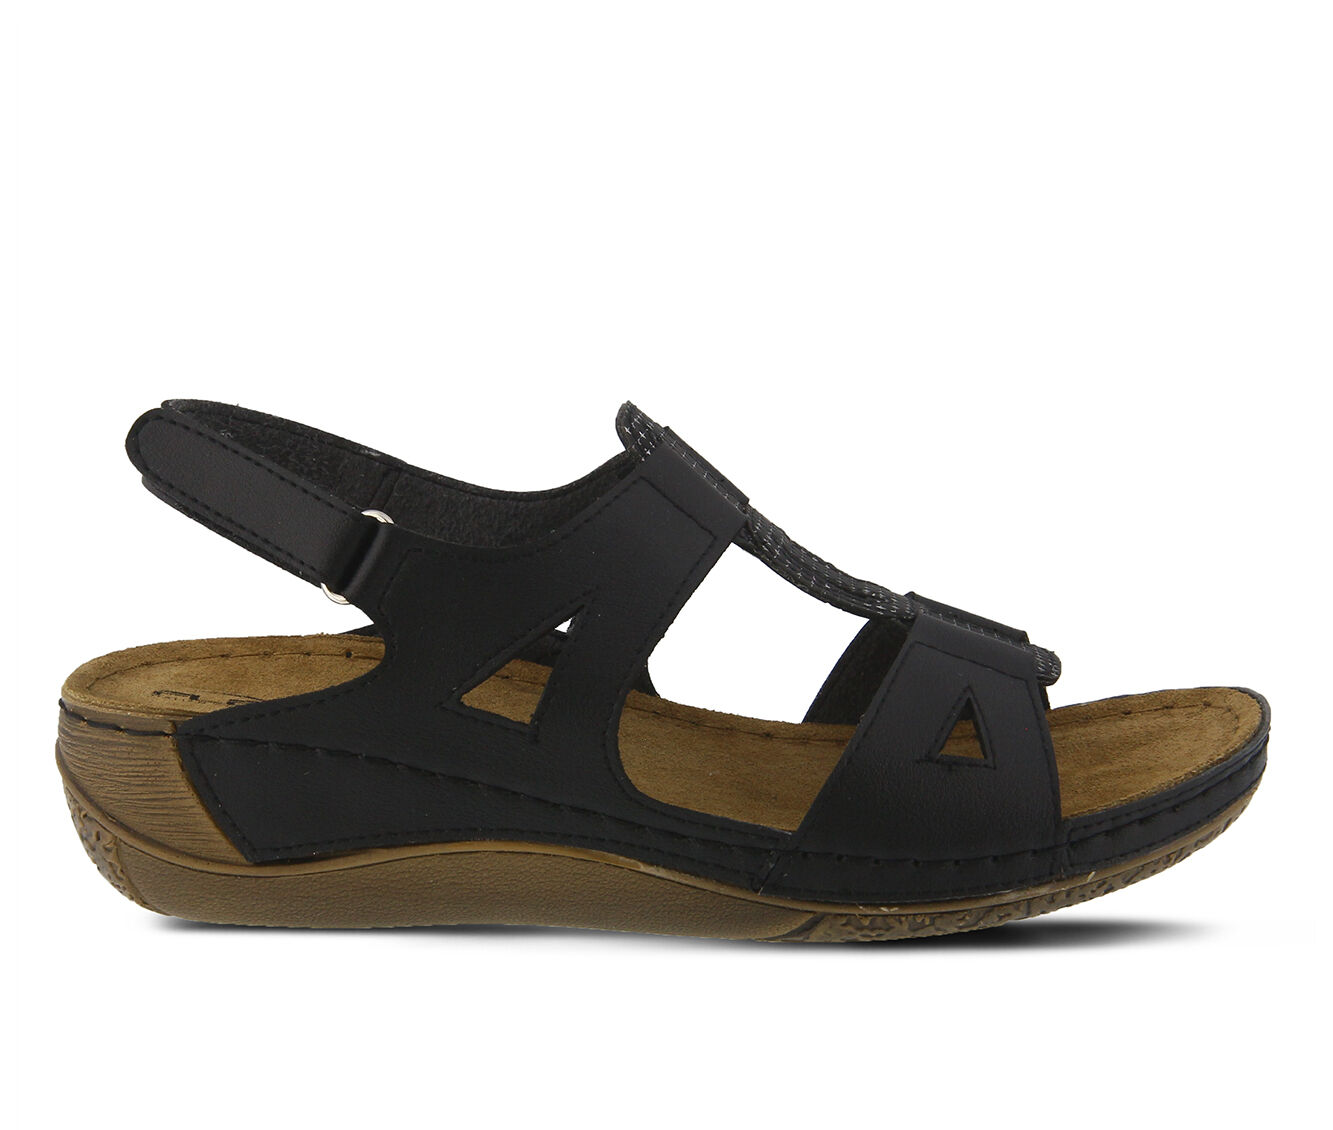 Women's FLEXUS Naxos Sandals Black